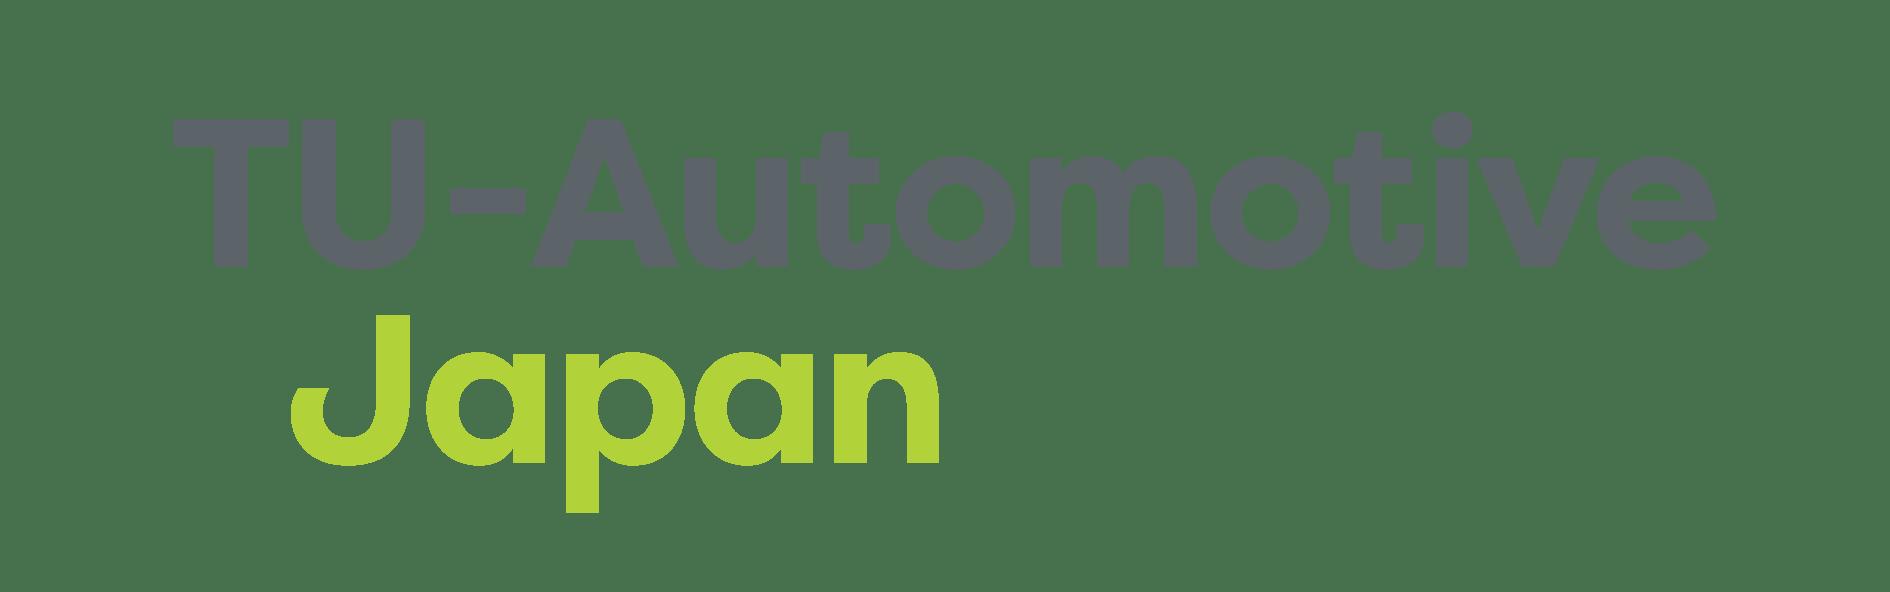 TU-Automotive Japan